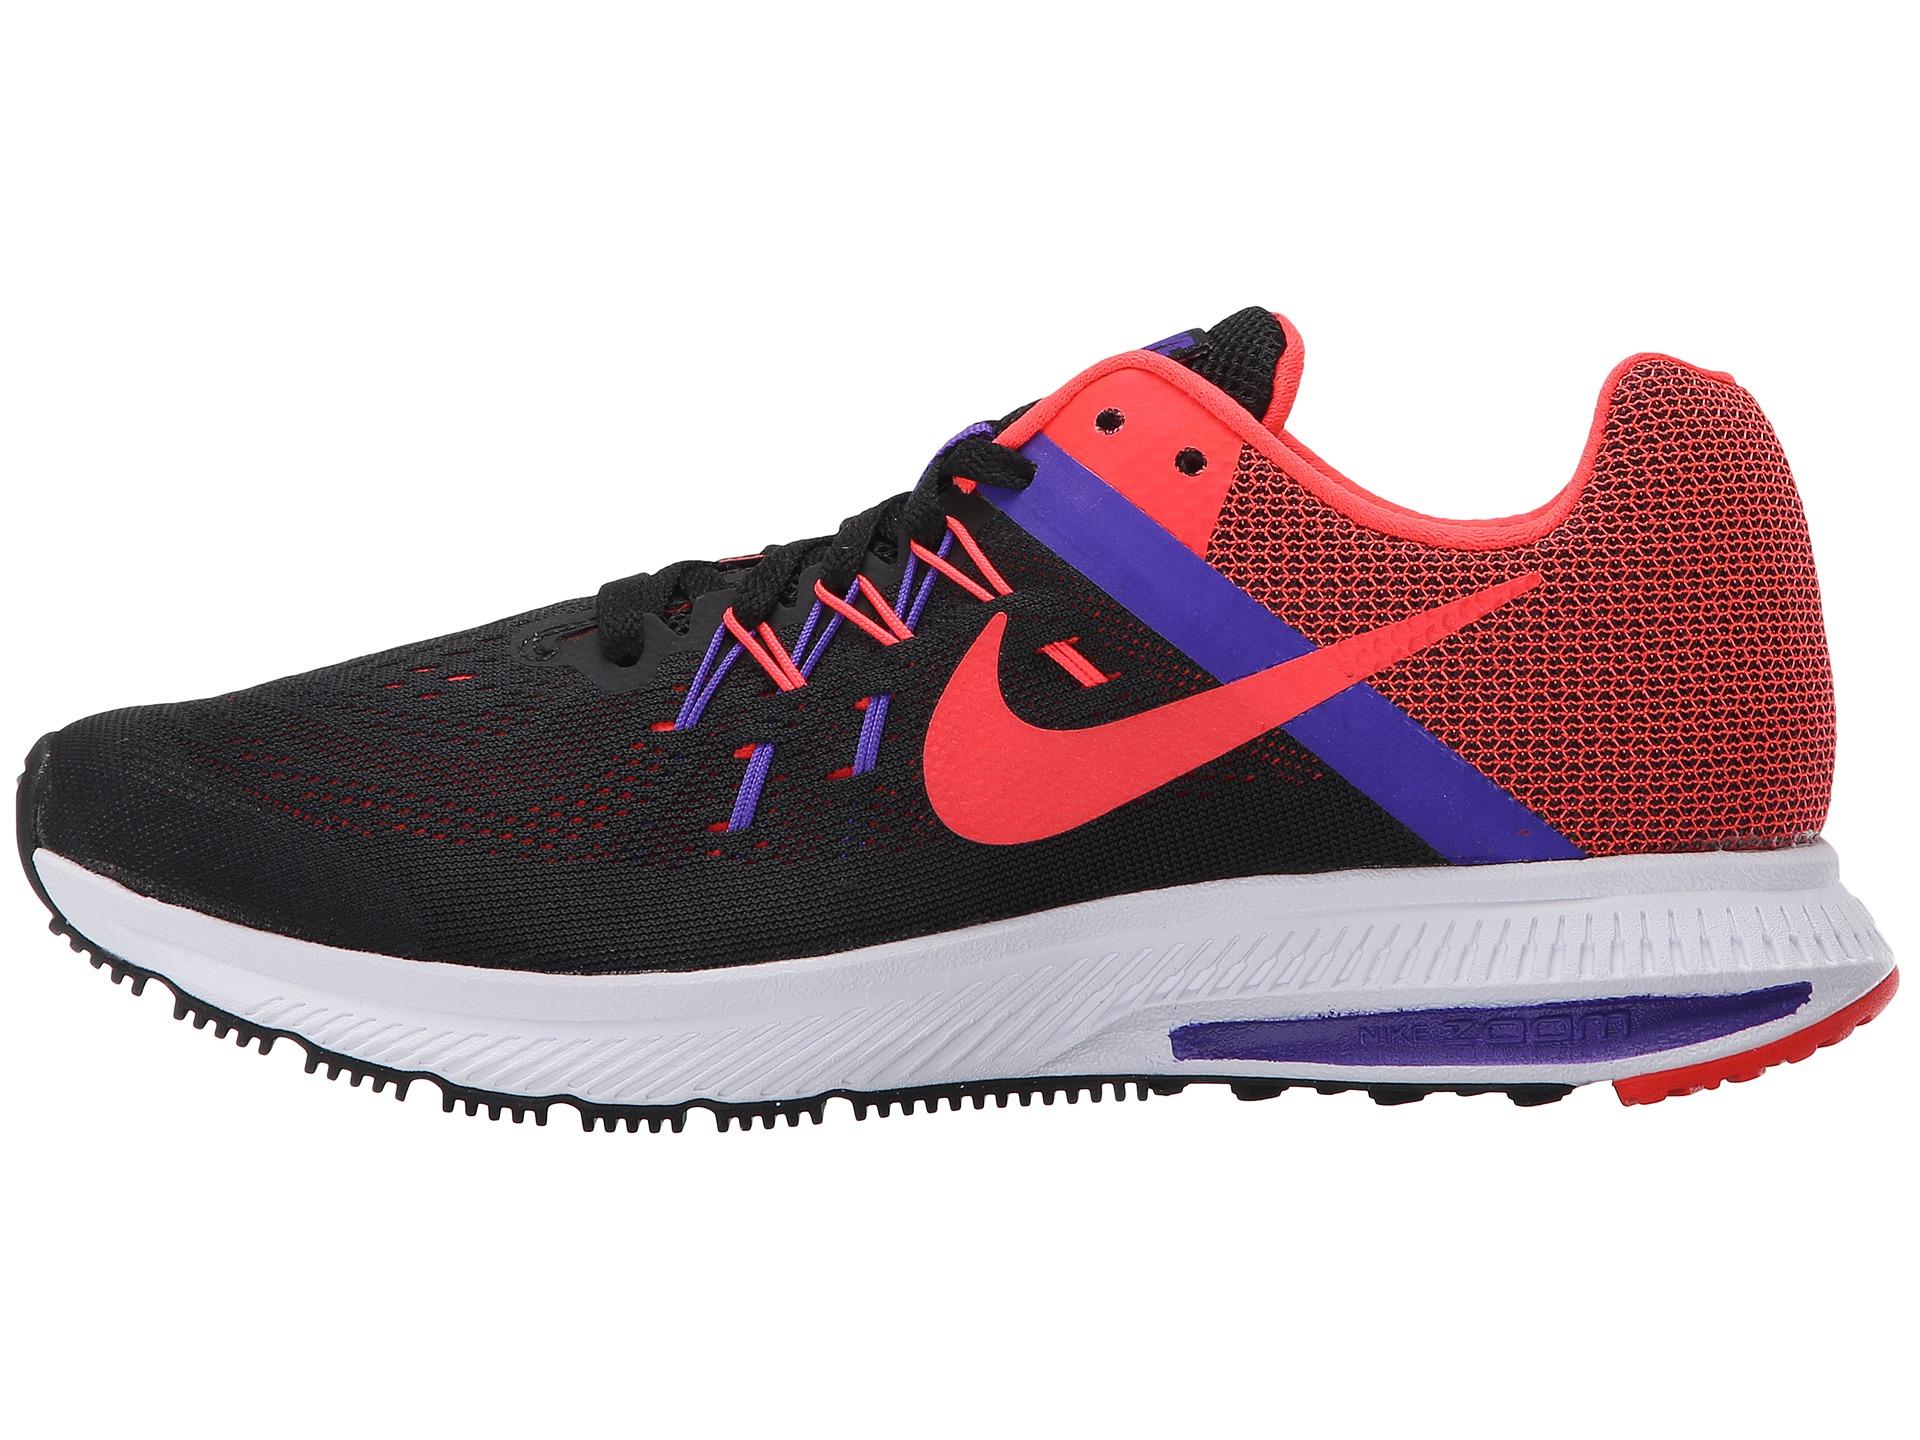 859d40fa9acc0 Nike Zoom Winflo 2 in Red (Black Fierce Purple White Bright)